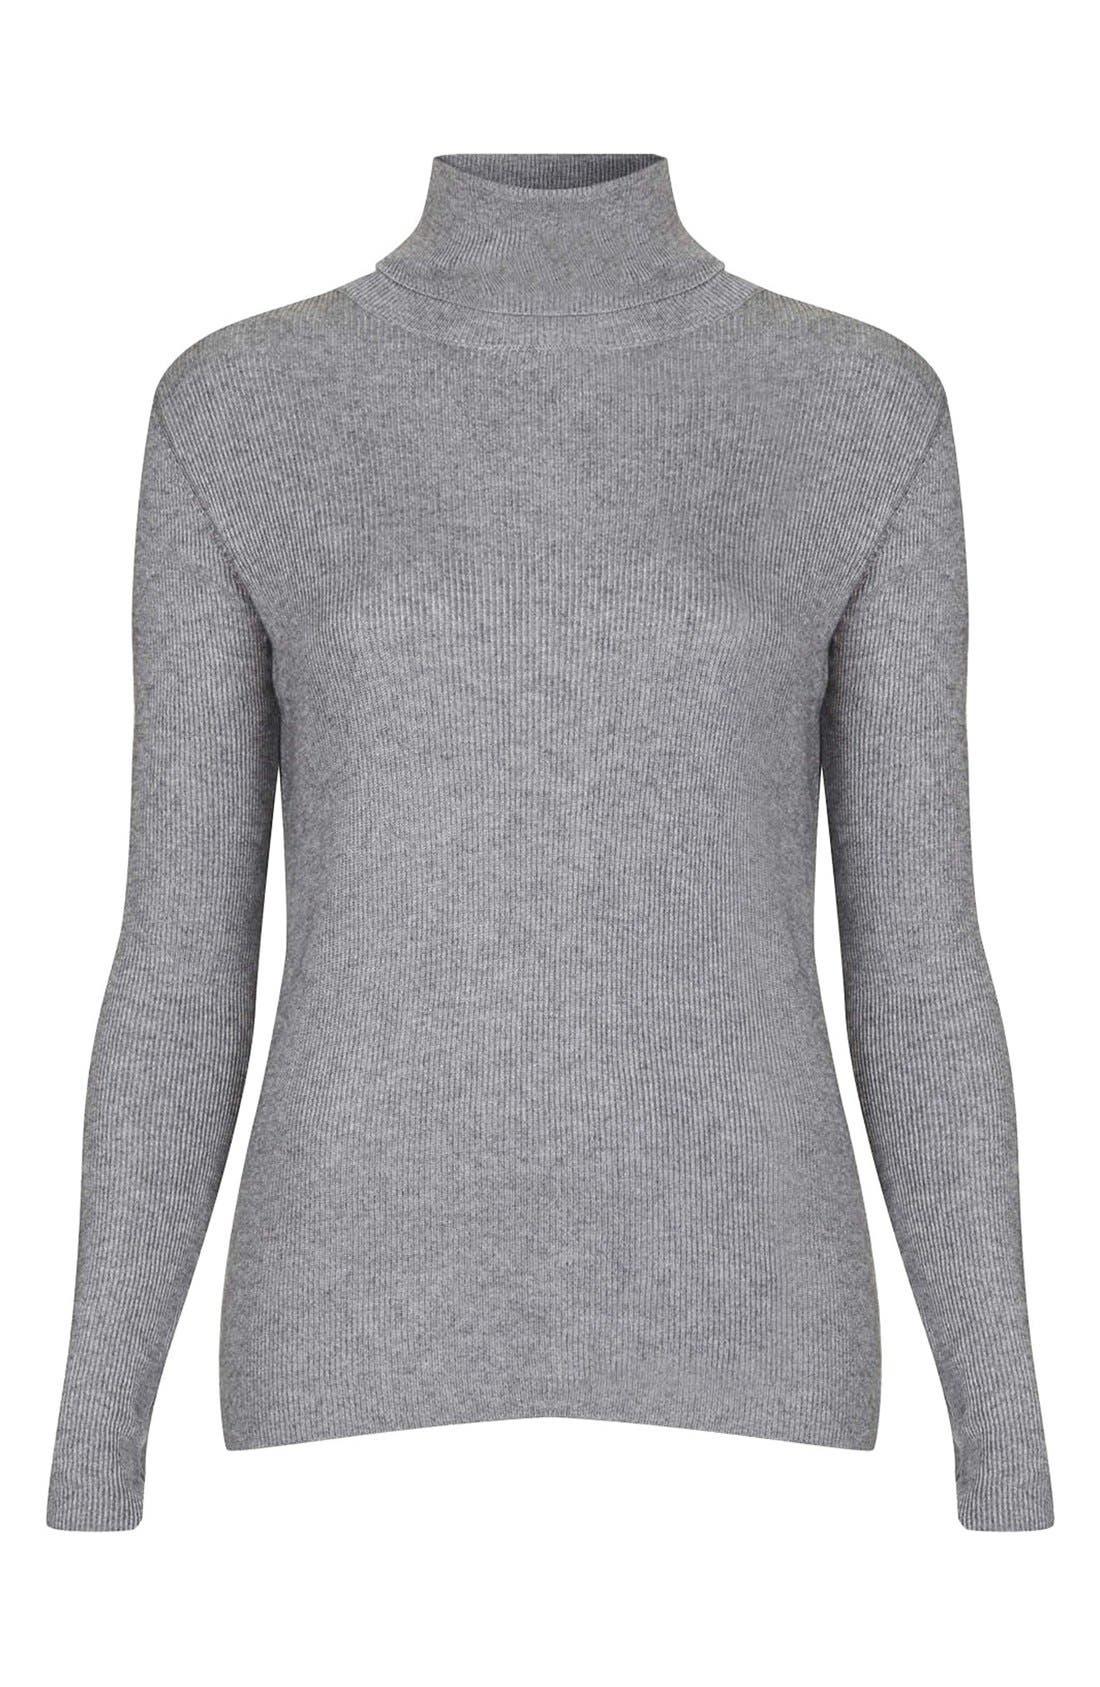 Main Image - Topshop Ribbed Turtleneck Sweater